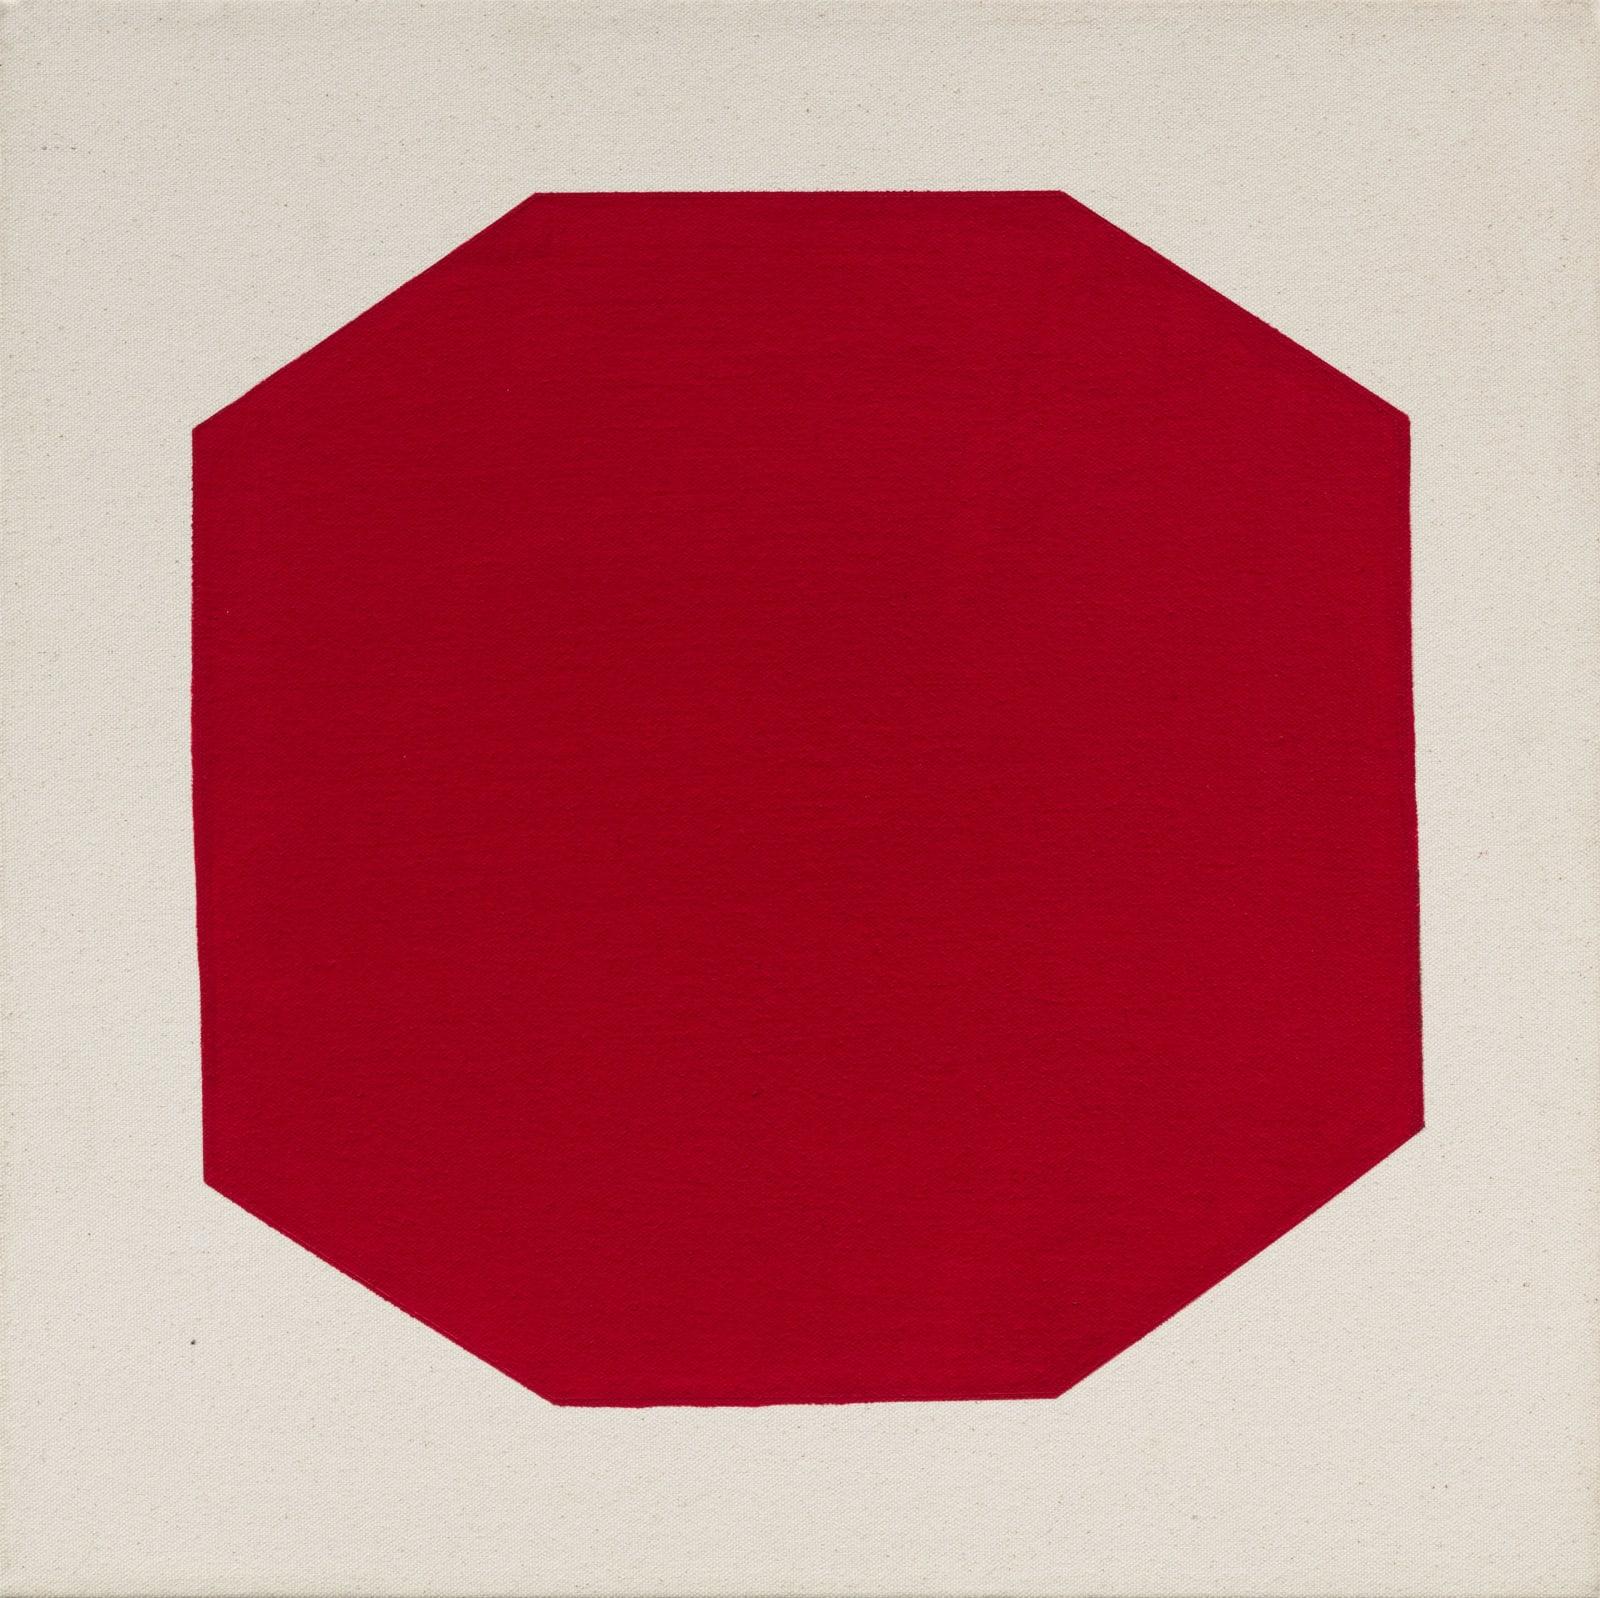 Julie Umerle, Polygon (red), 2018